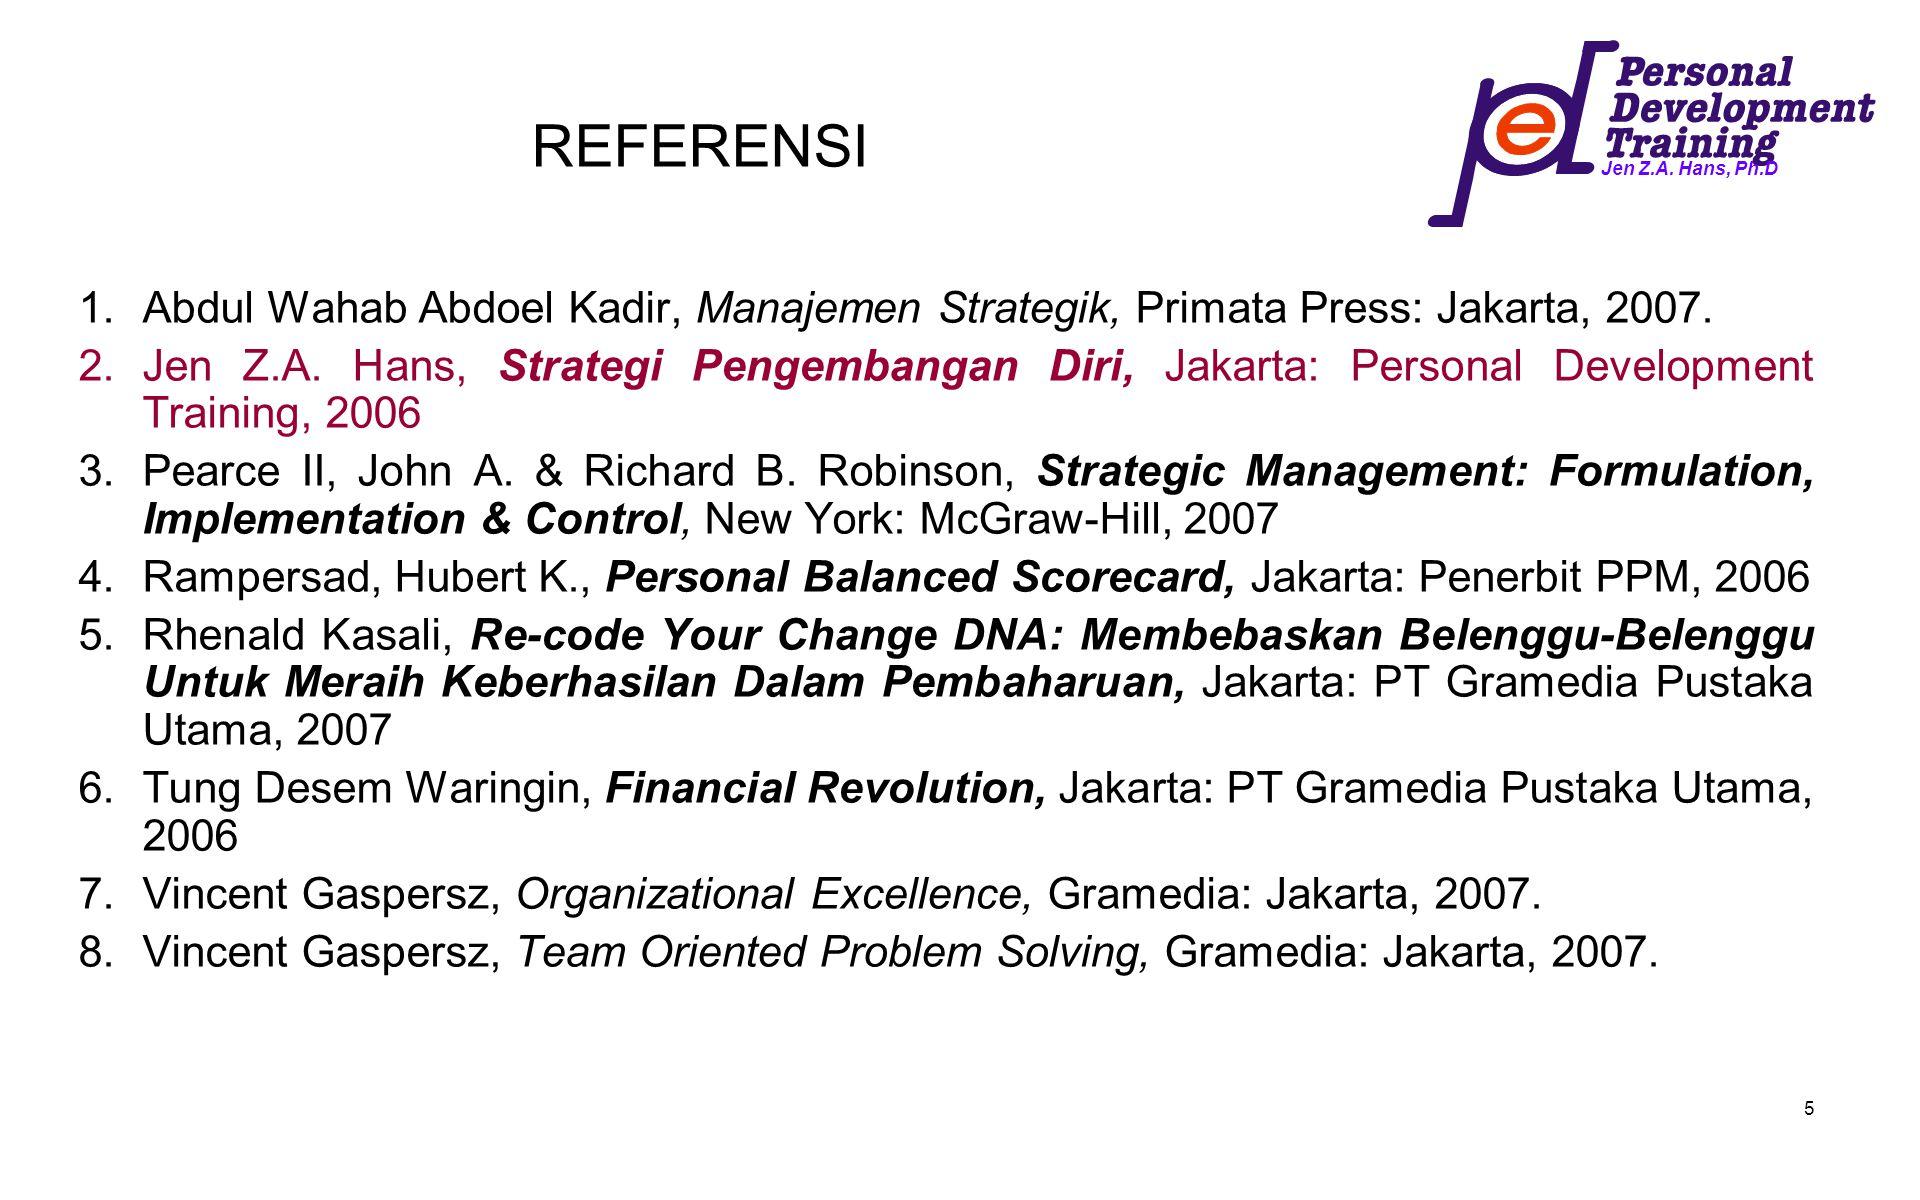 REFERENSI Abdul Wahab Abdoel Kadir, Manajemen Strategik, Primata Press: Jakarta, 2007.